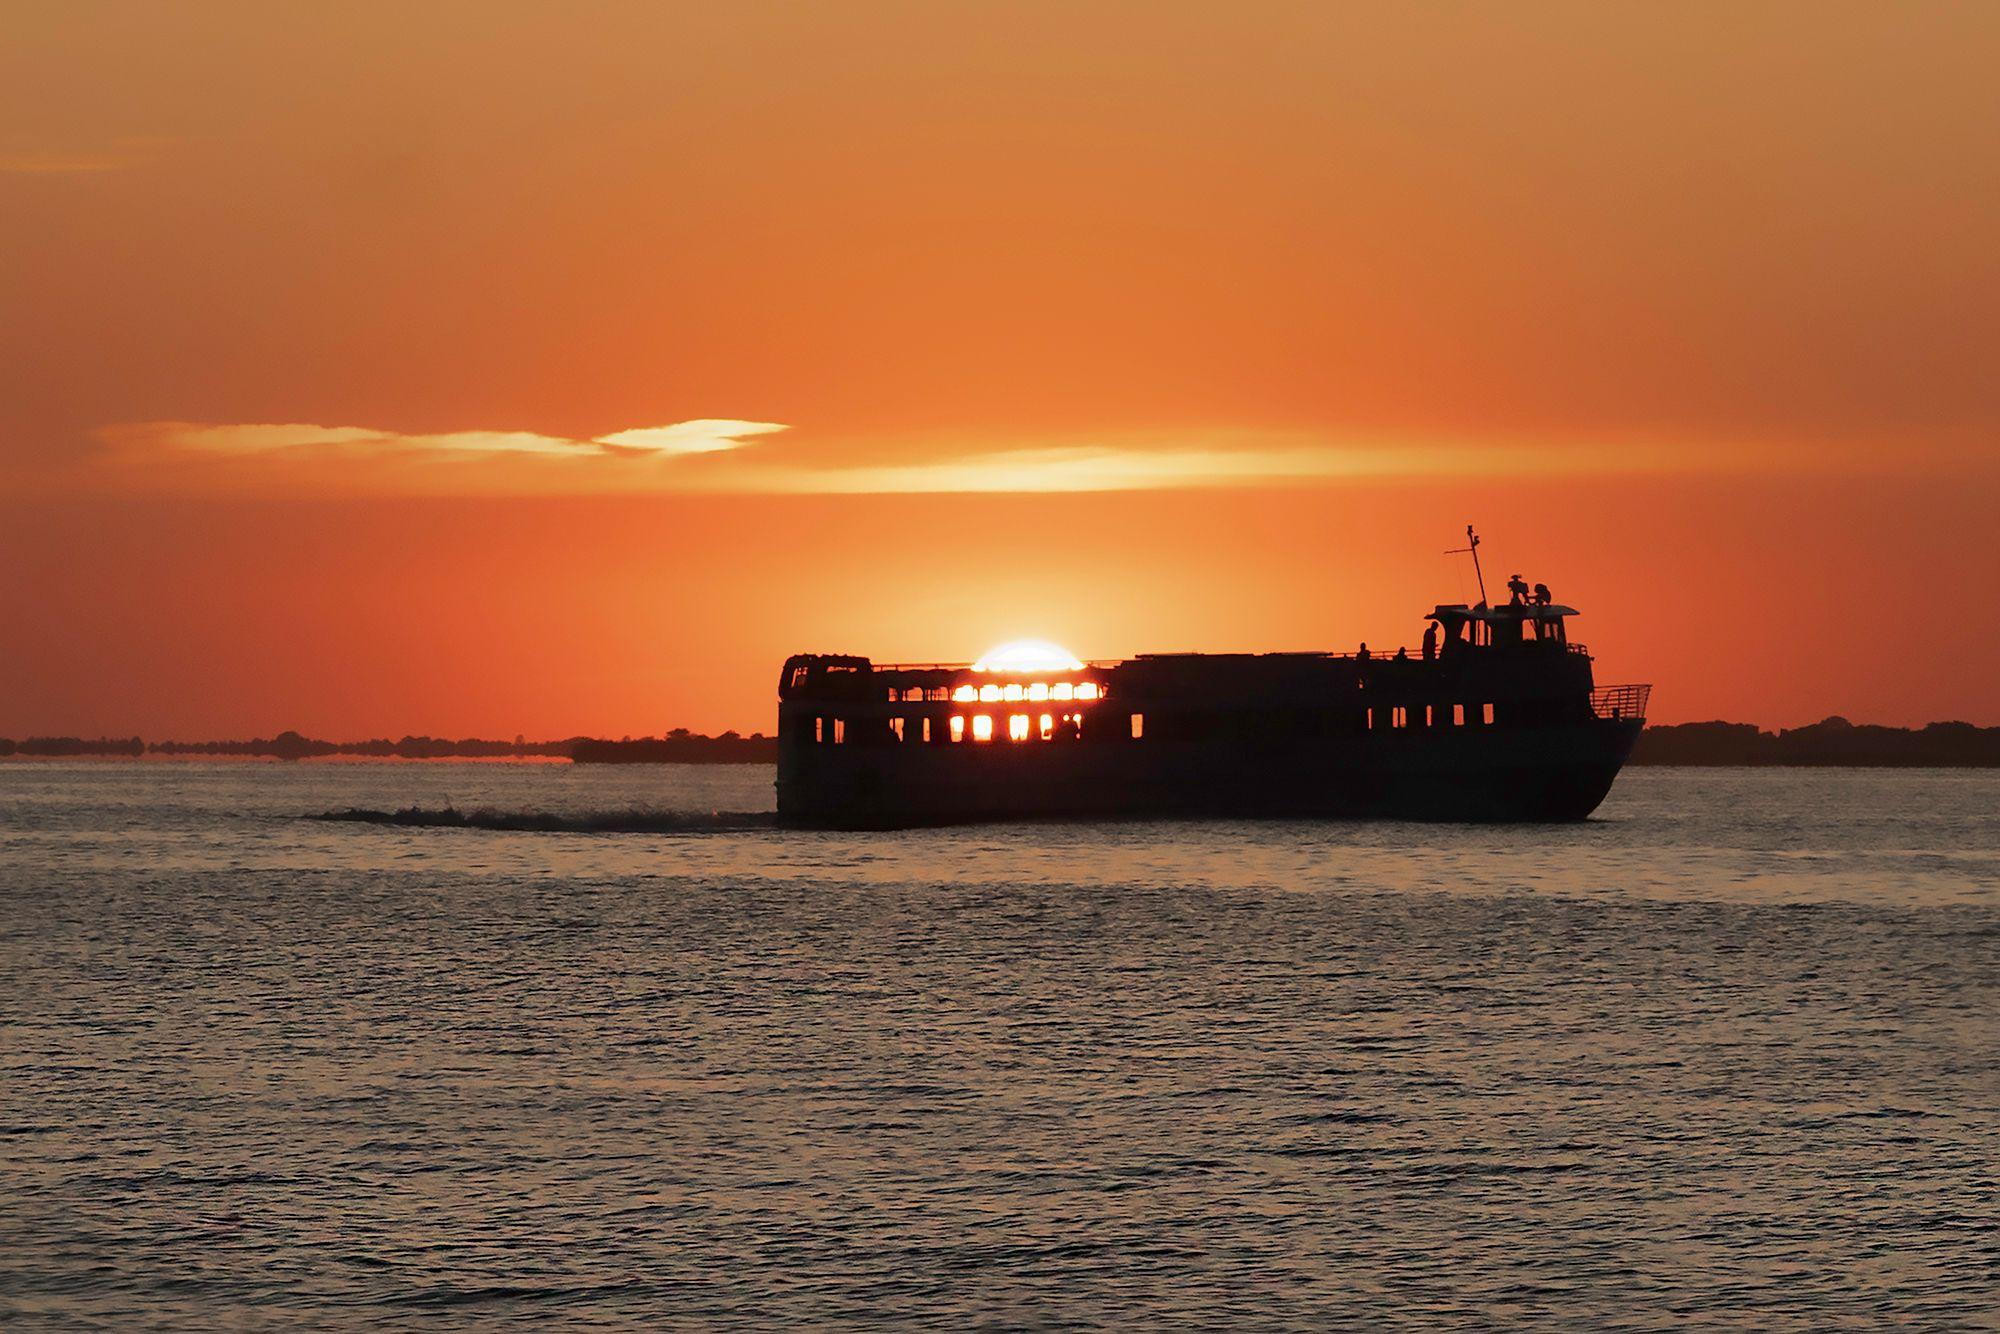 FI Ferry Swallows Sun